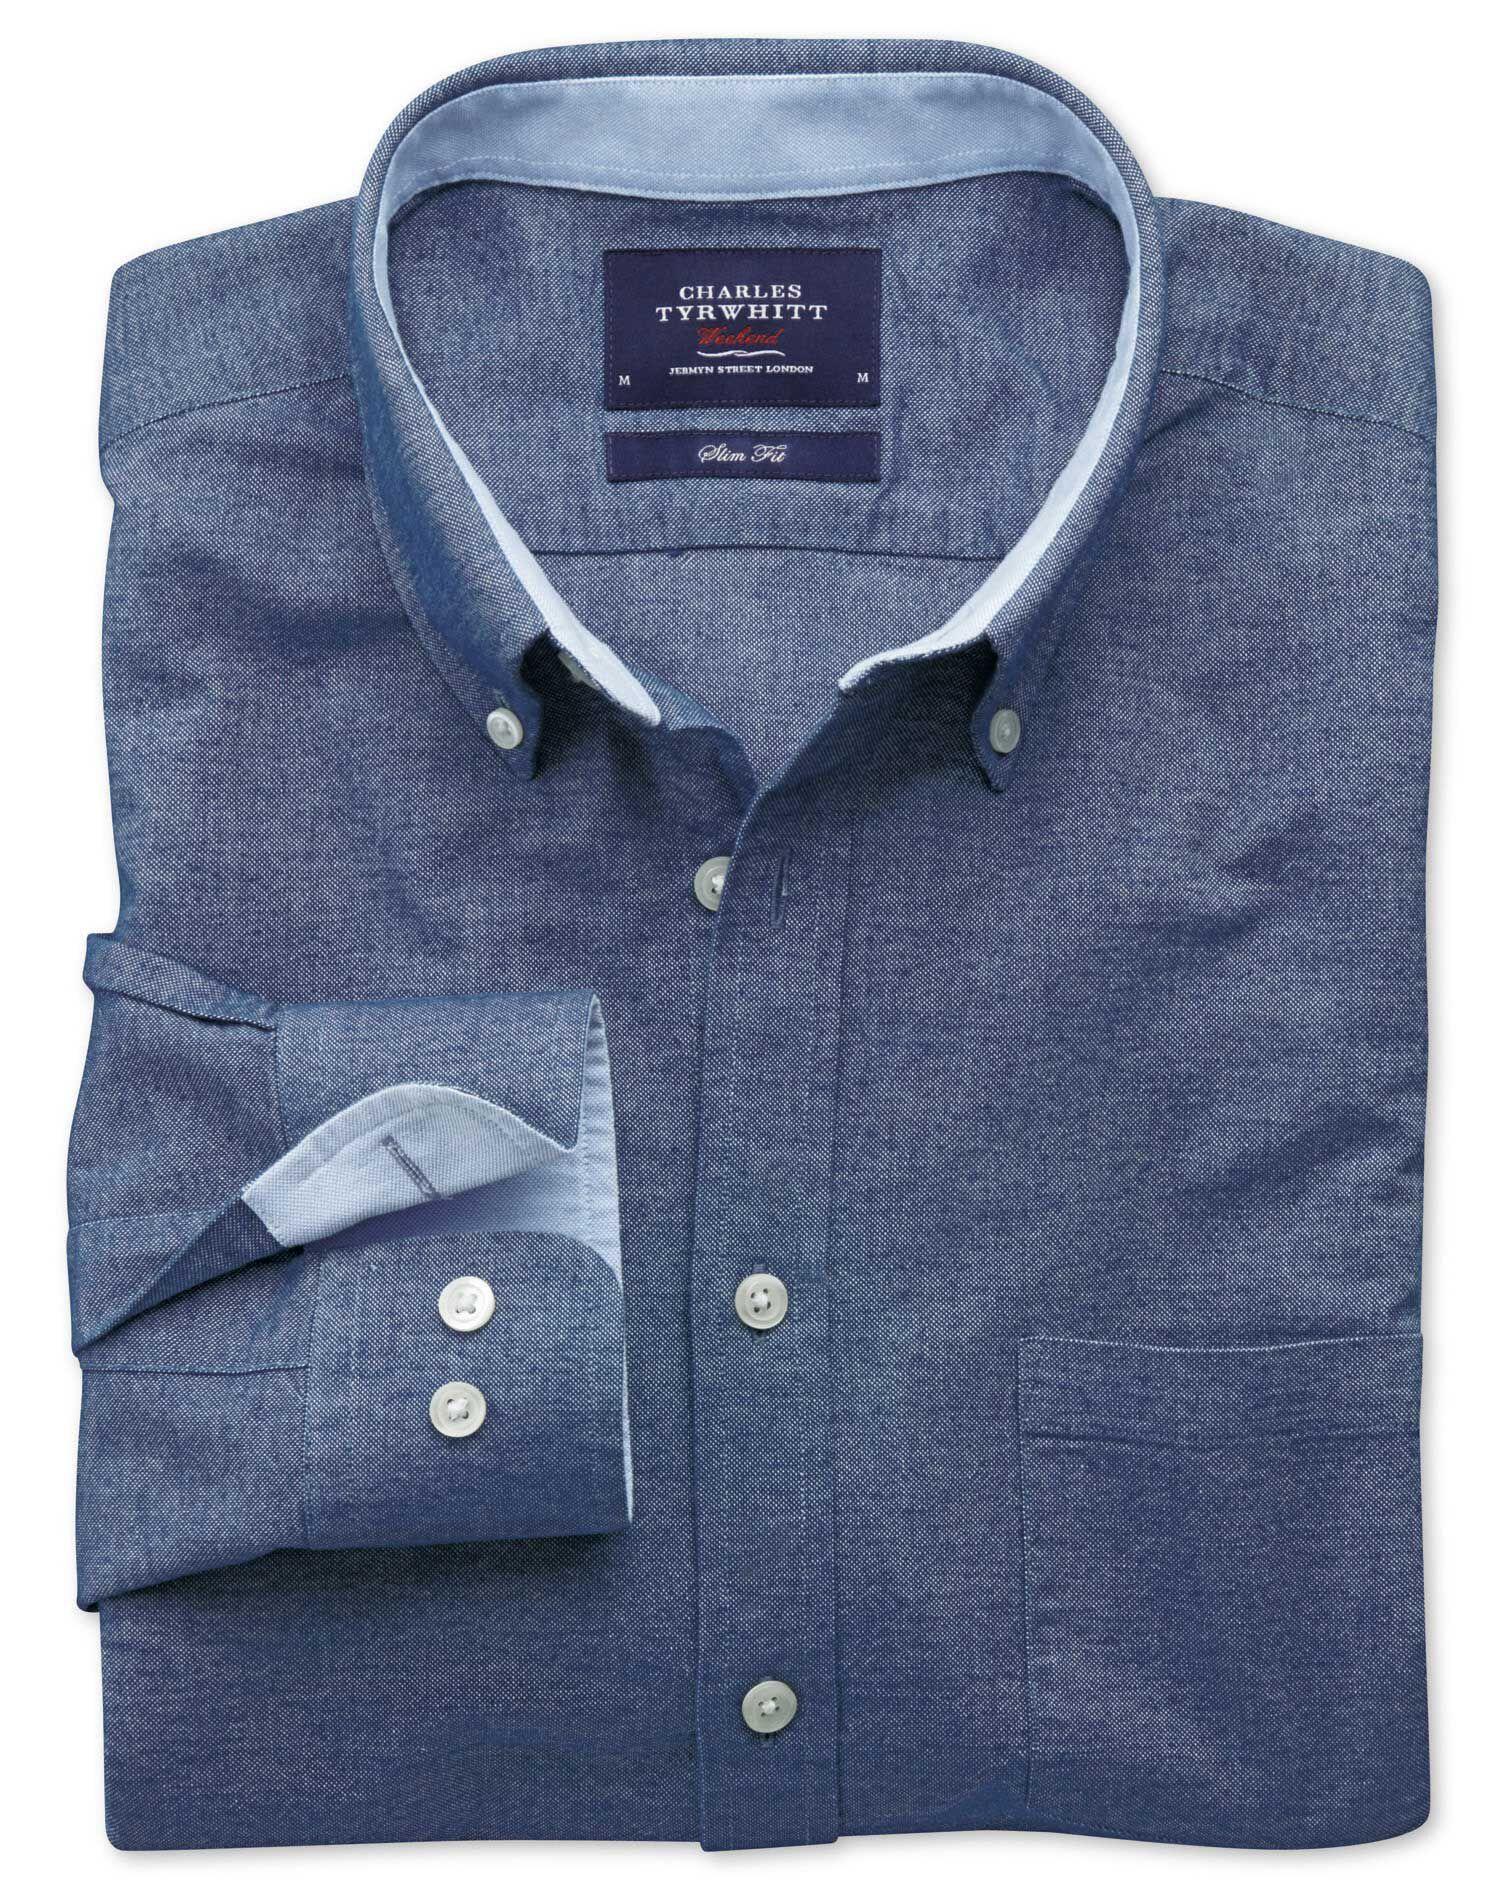 Slim Fit Blue Washed Oxford Cotton Shirt Single Cuff Size XXL by Charles Tyrwhitt